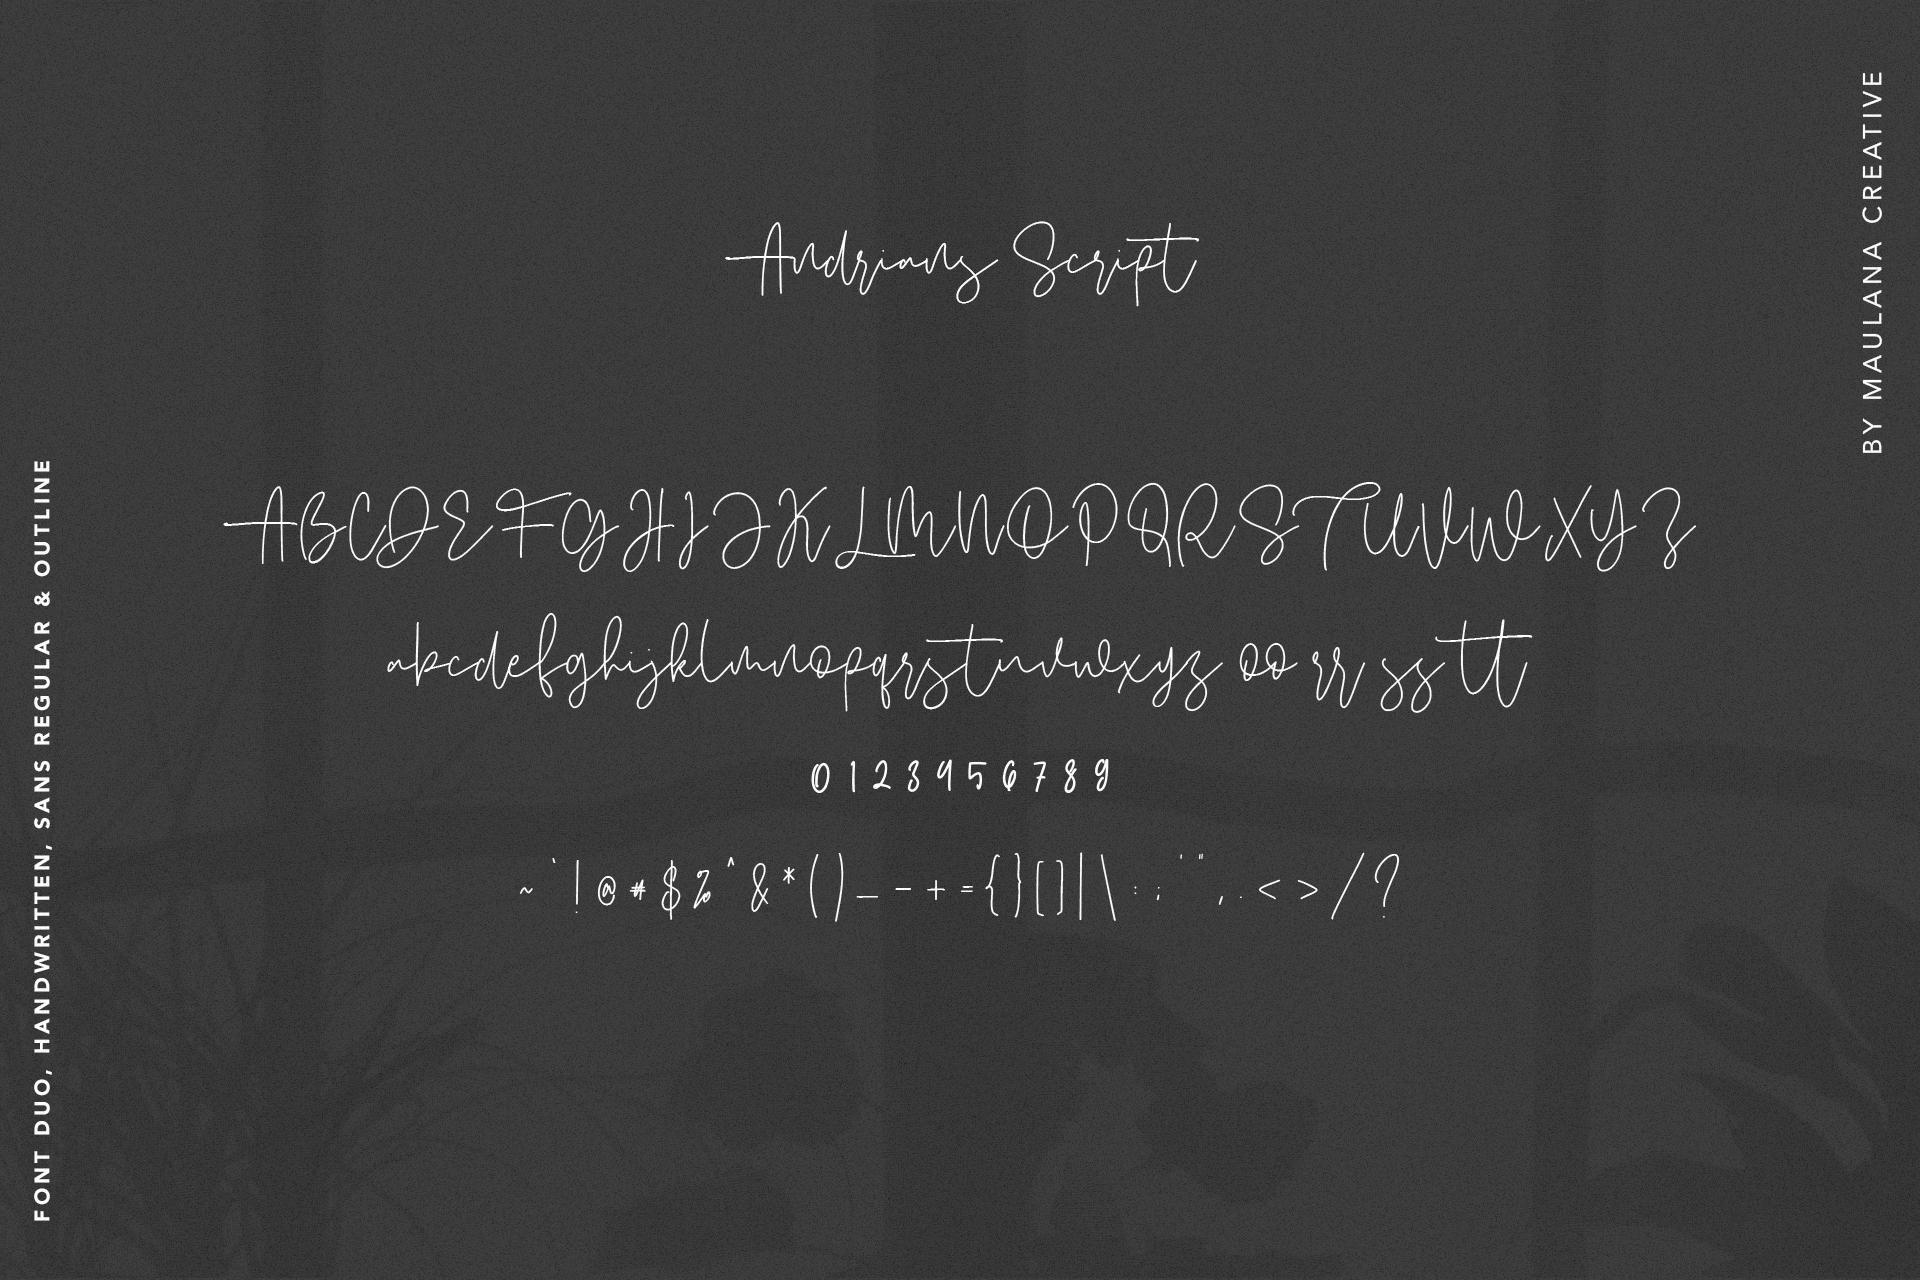 Andrians Script Sans Font example image 10